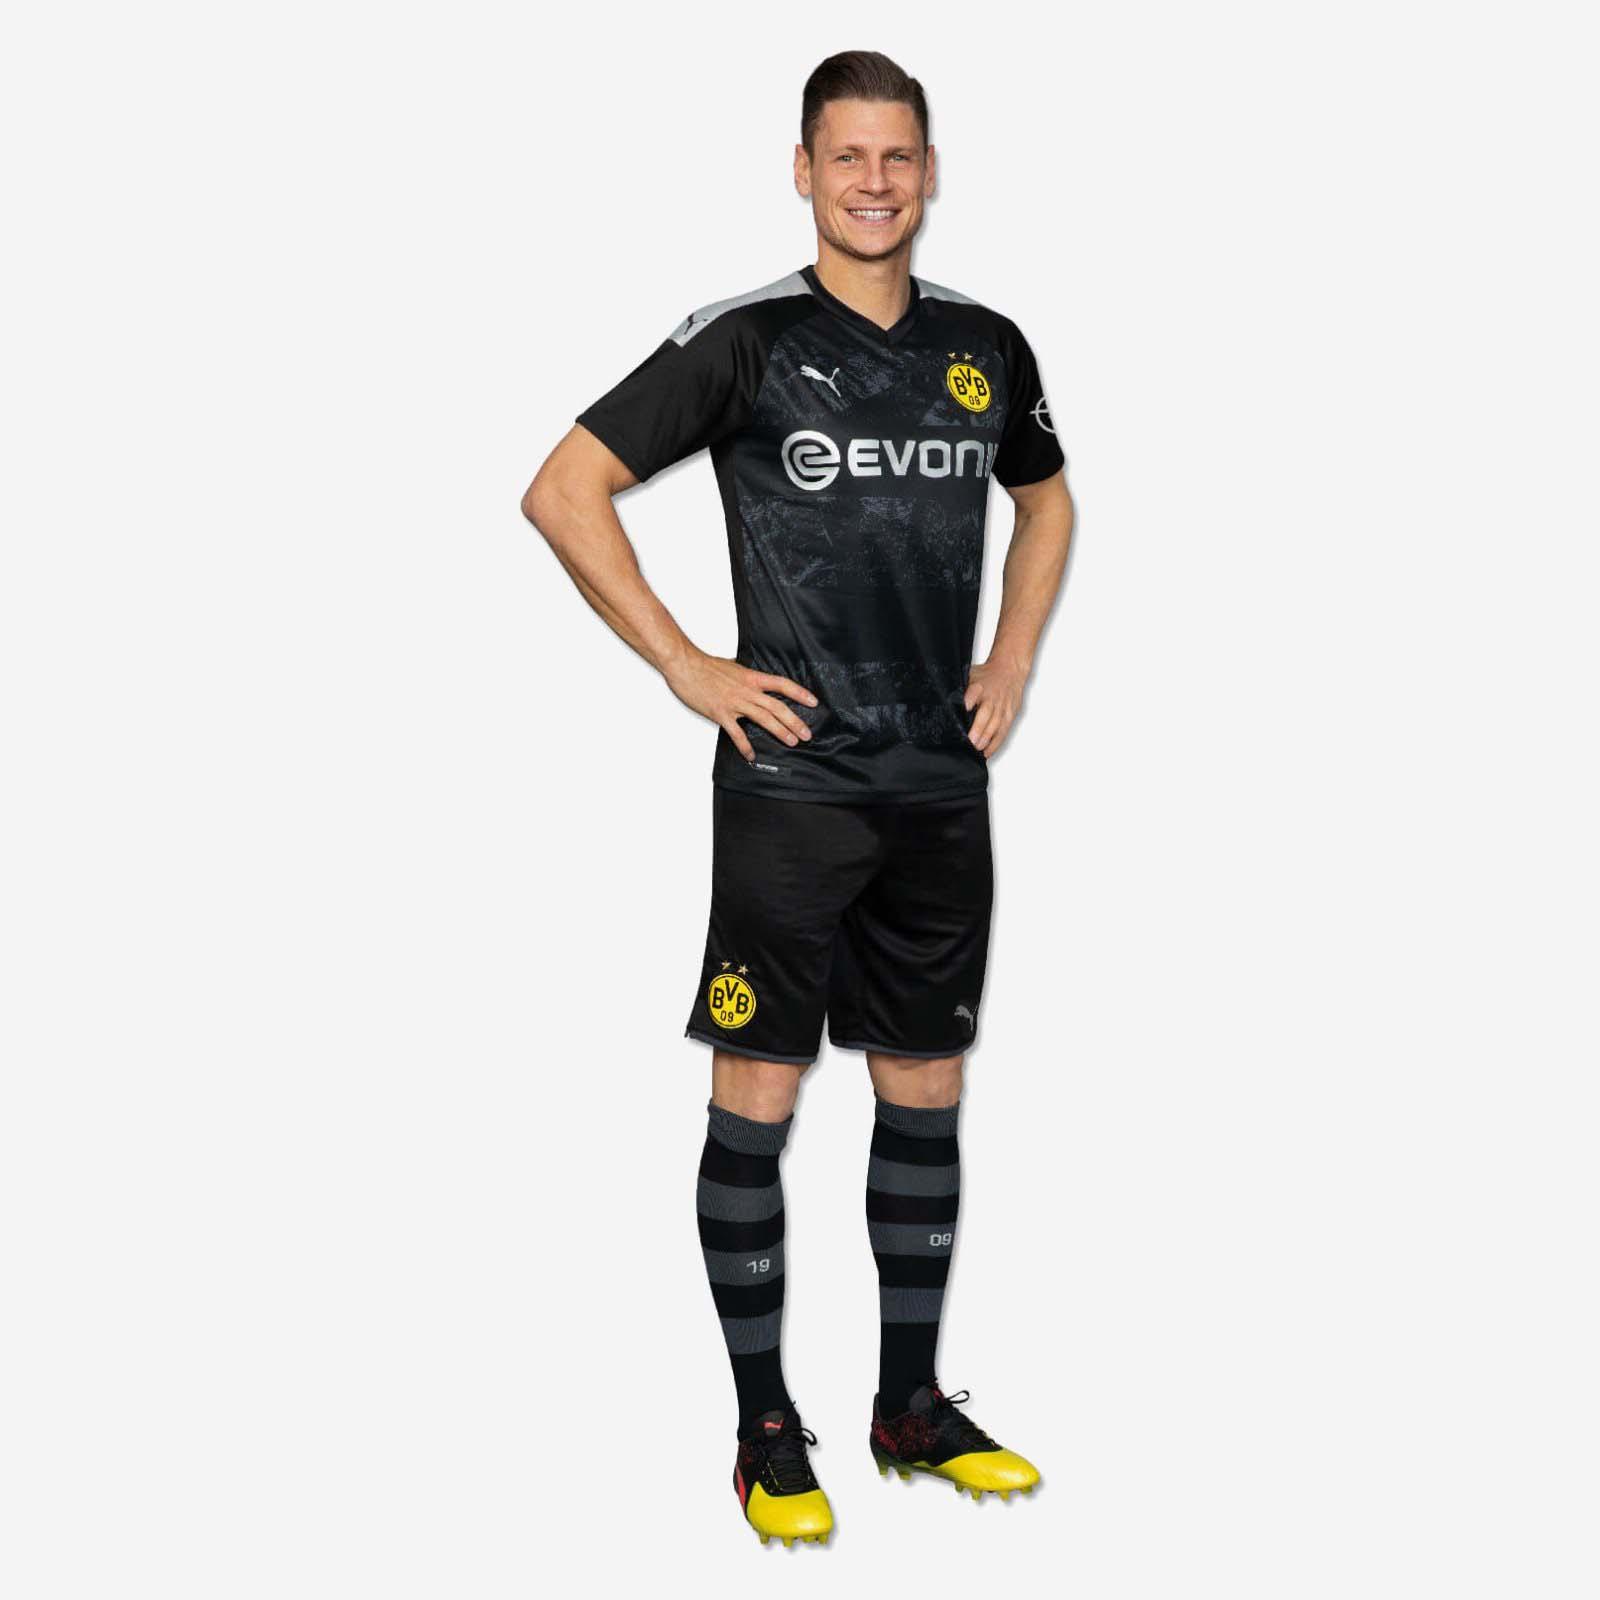 19 20 Borussia Dortmund Away Black Soccer Jerseys Shirt Player Version Borussia Dortmund Soccerdealshop